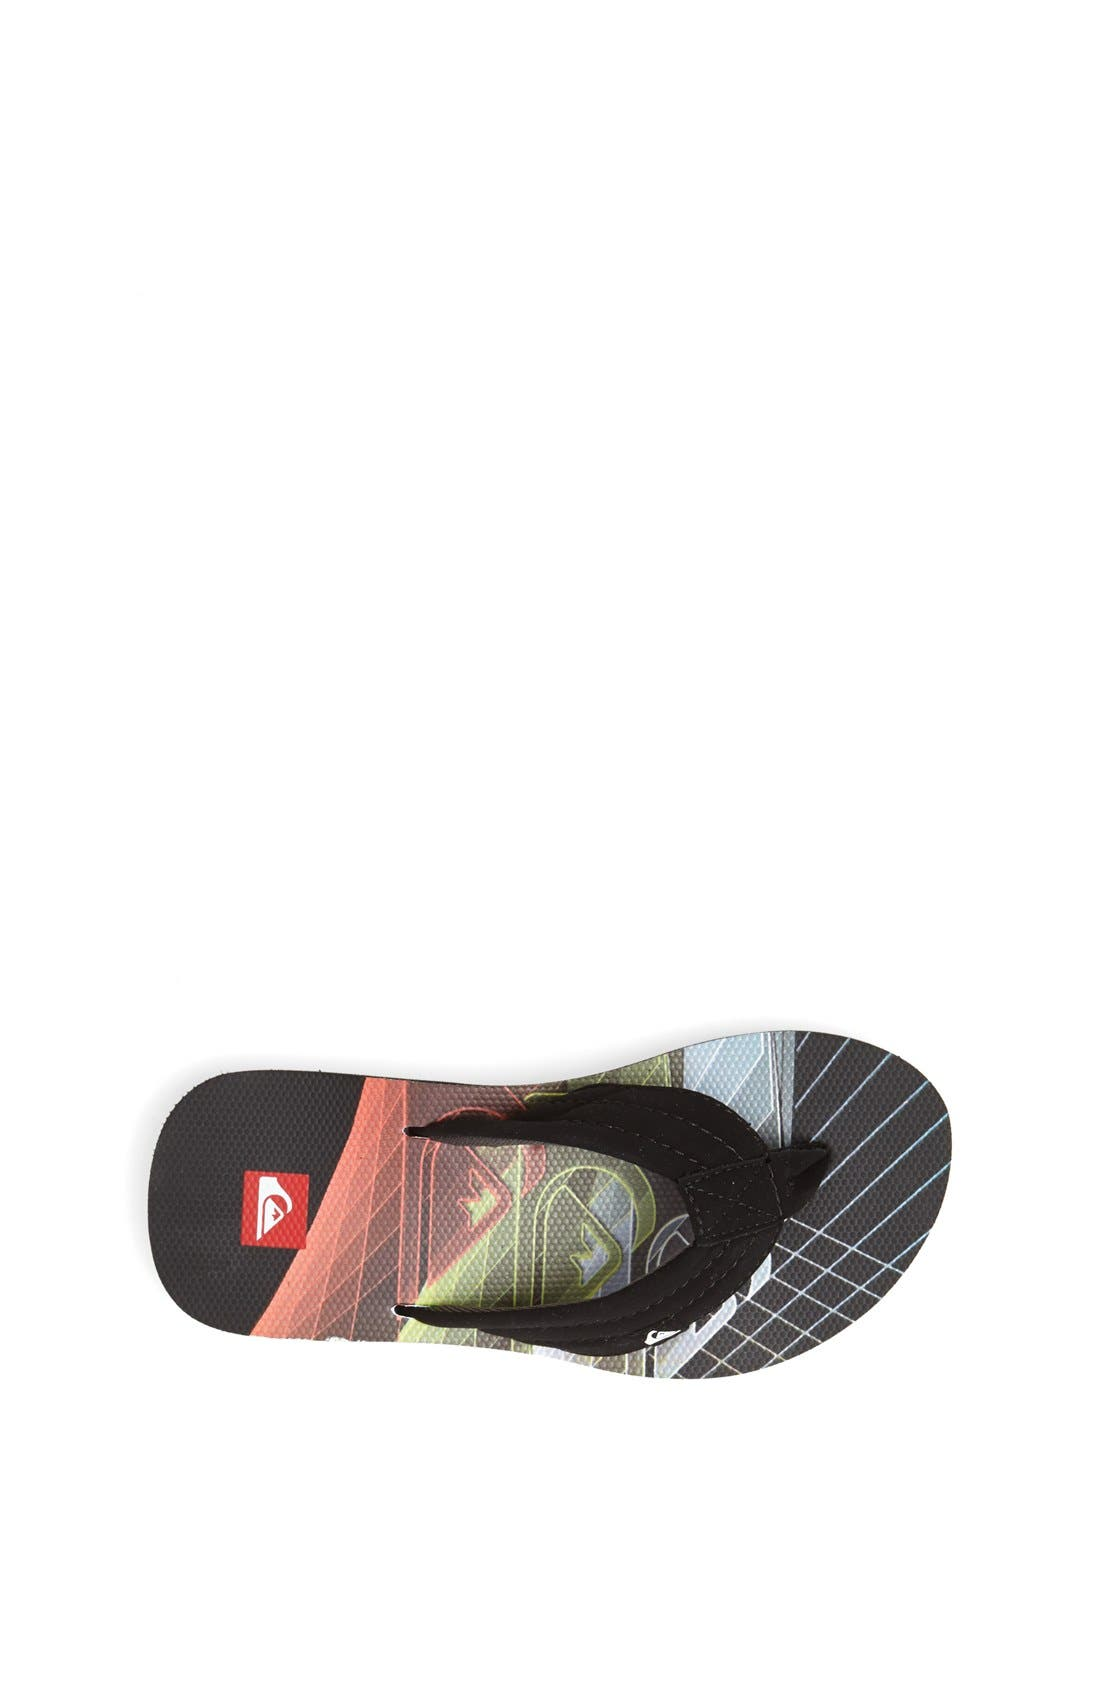 Alternate Image 3  - Quiksilver 'Foundation 2' Flip Flop (Little Kid & Big Kid)